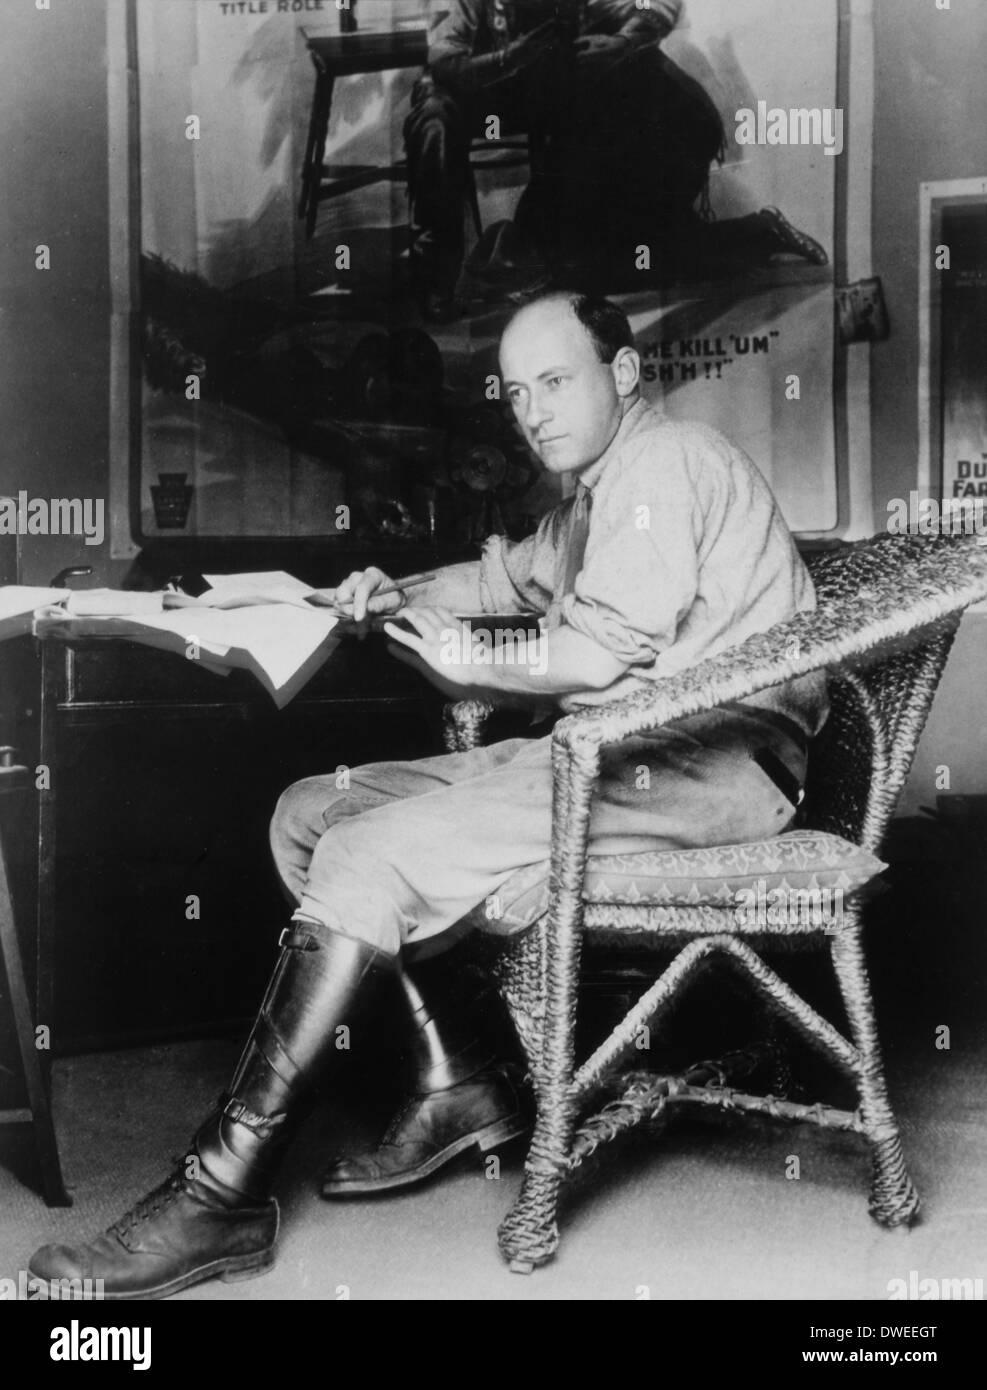 Cecil B. DeMille (1881-1959), American Director, Portrait, 1914 - Stock Image